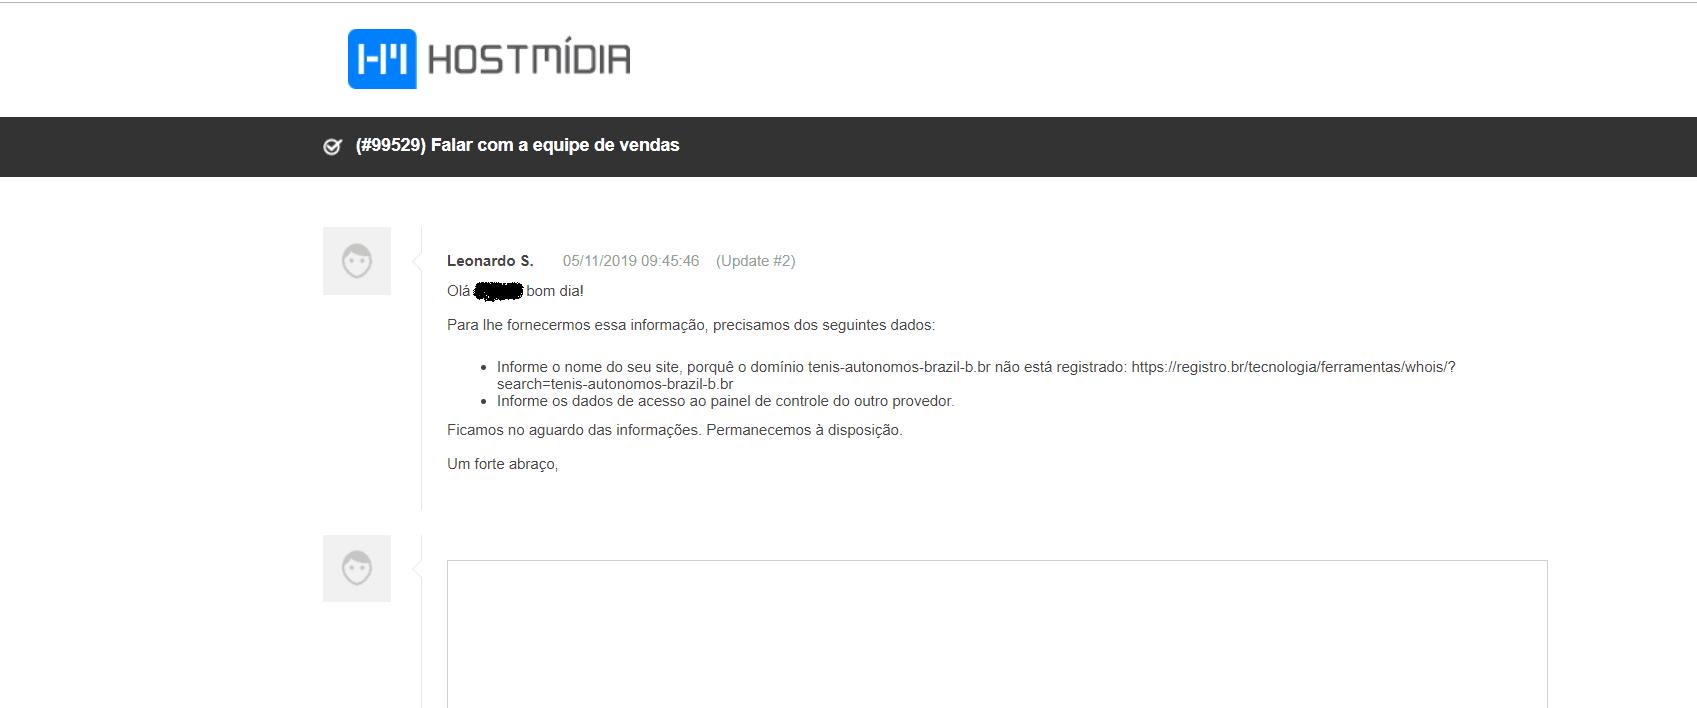 atendimento ao cliente chamado Hostmídia